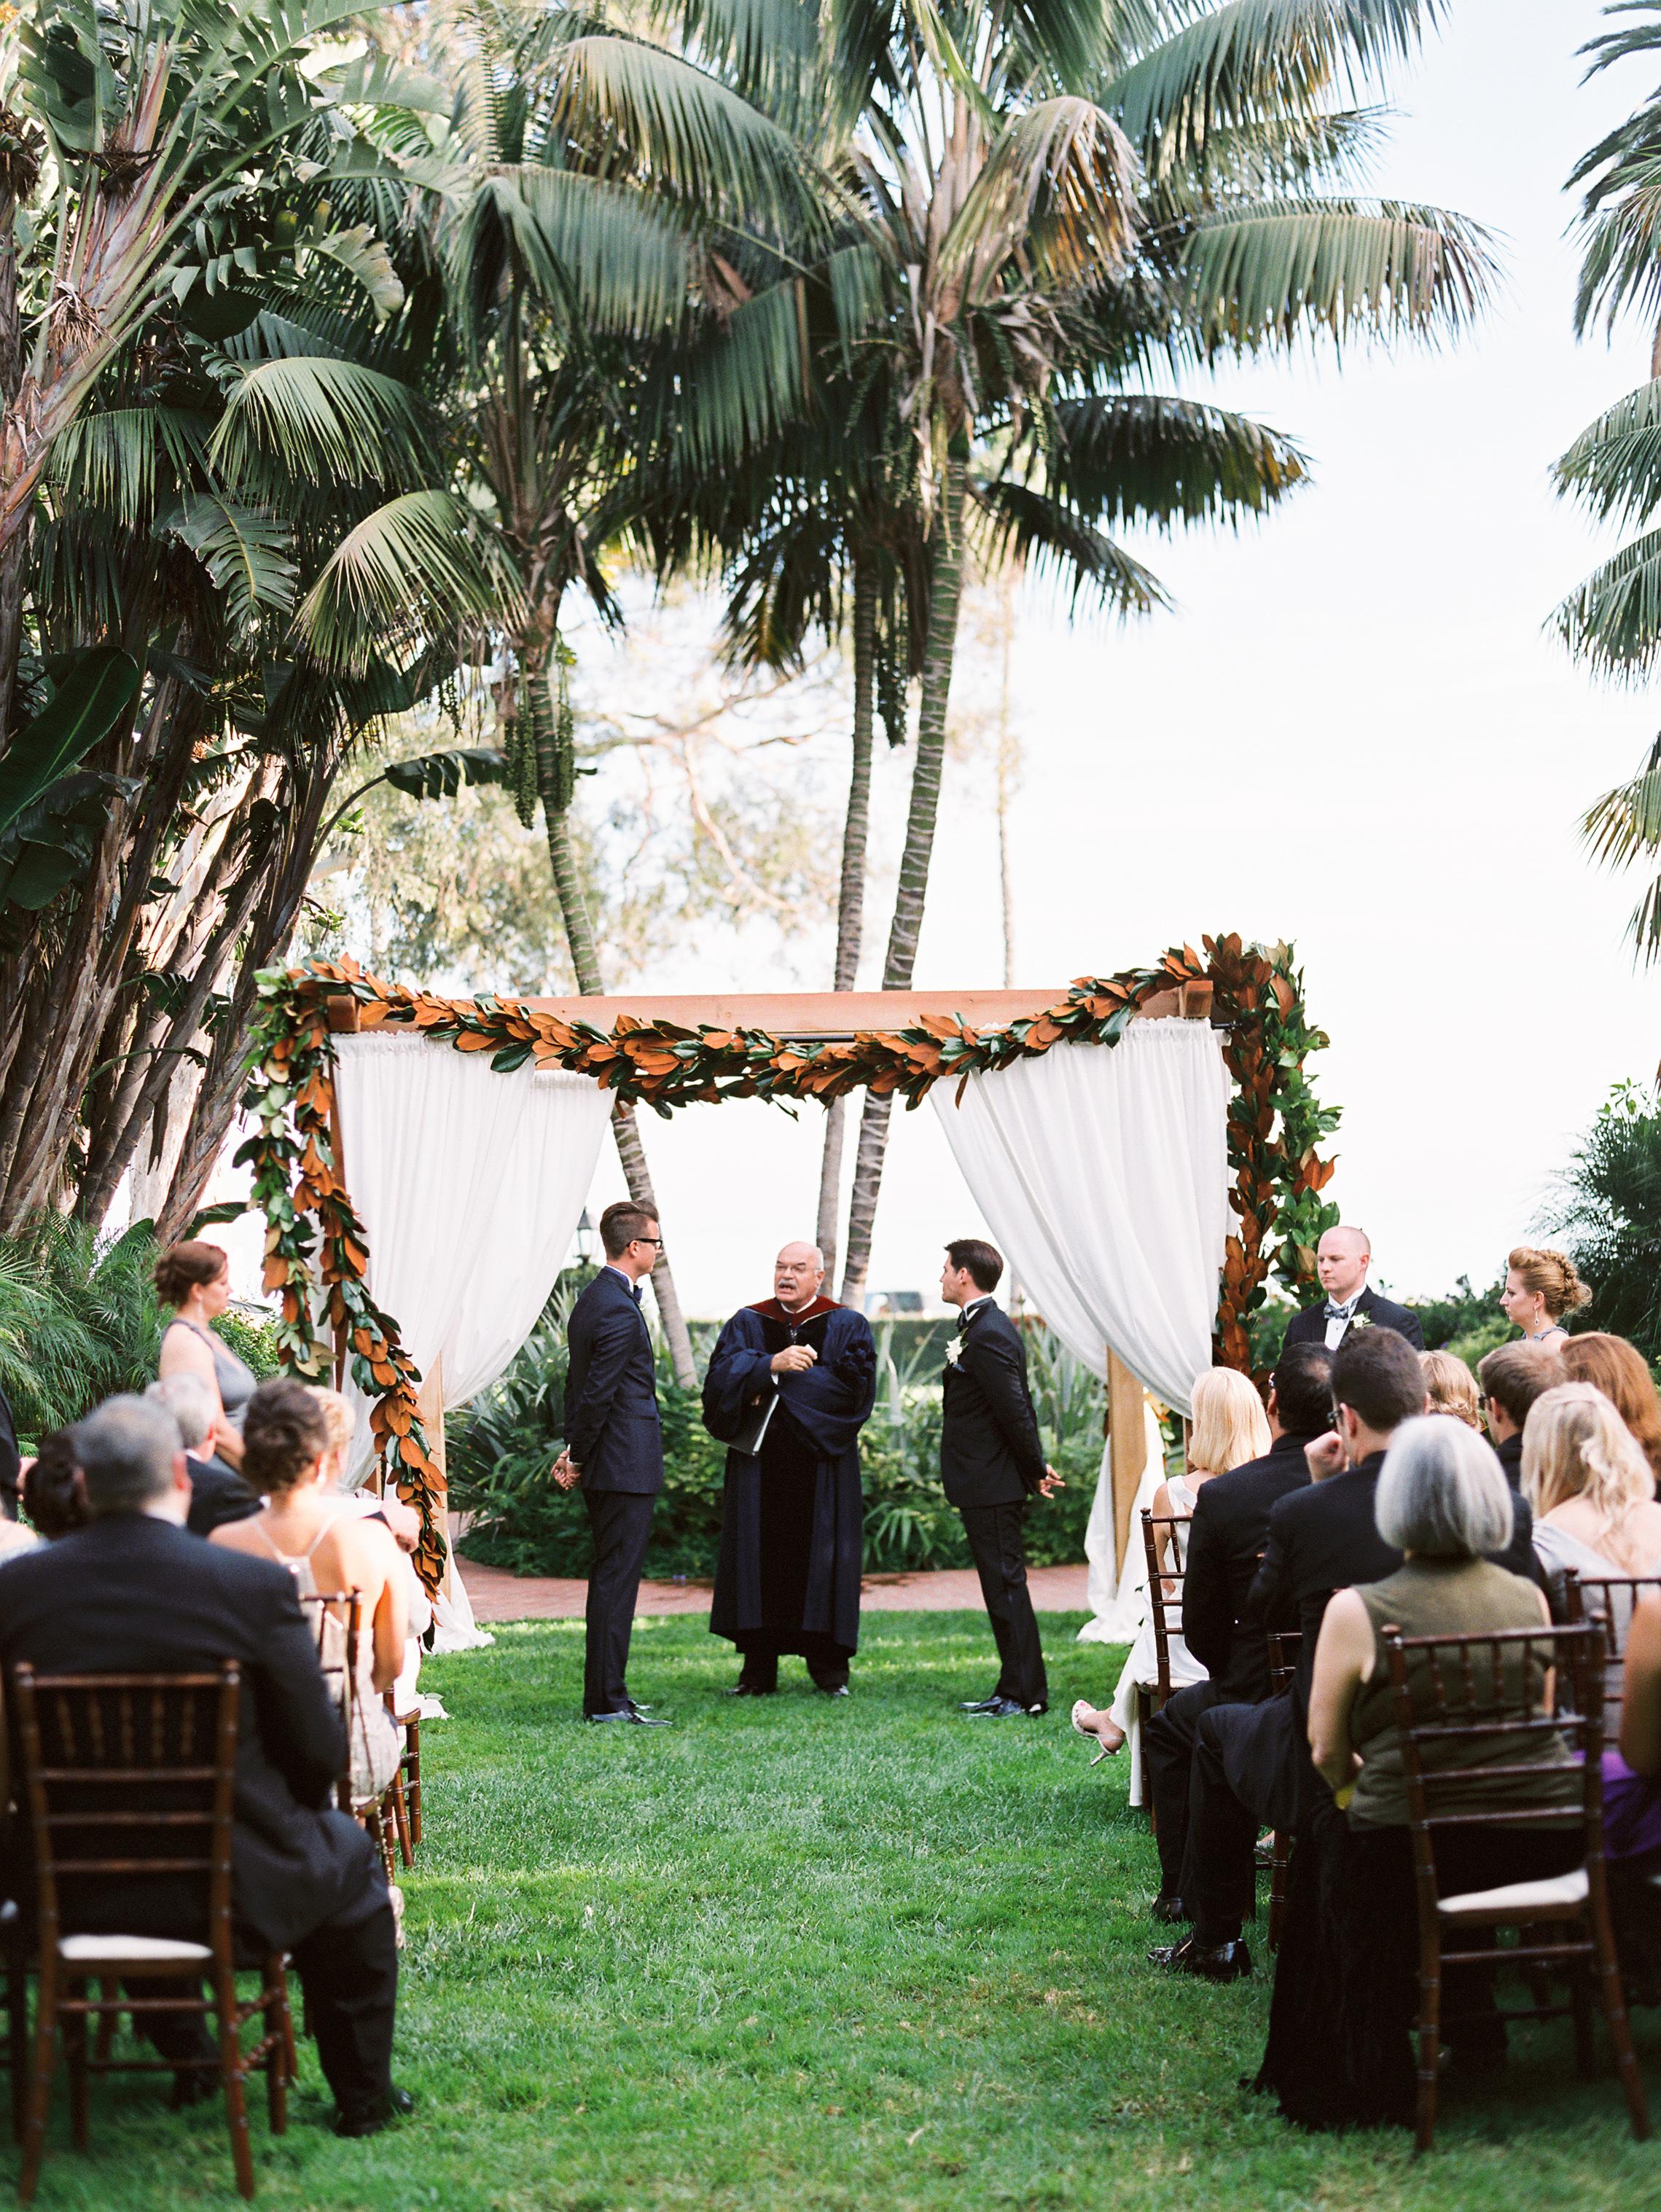 magnoliaeventdesign.com | Four Seasons Resort The Biltmore Santa Barbara Wedding Photographed by Linda Chaja | Magnolia Event Design